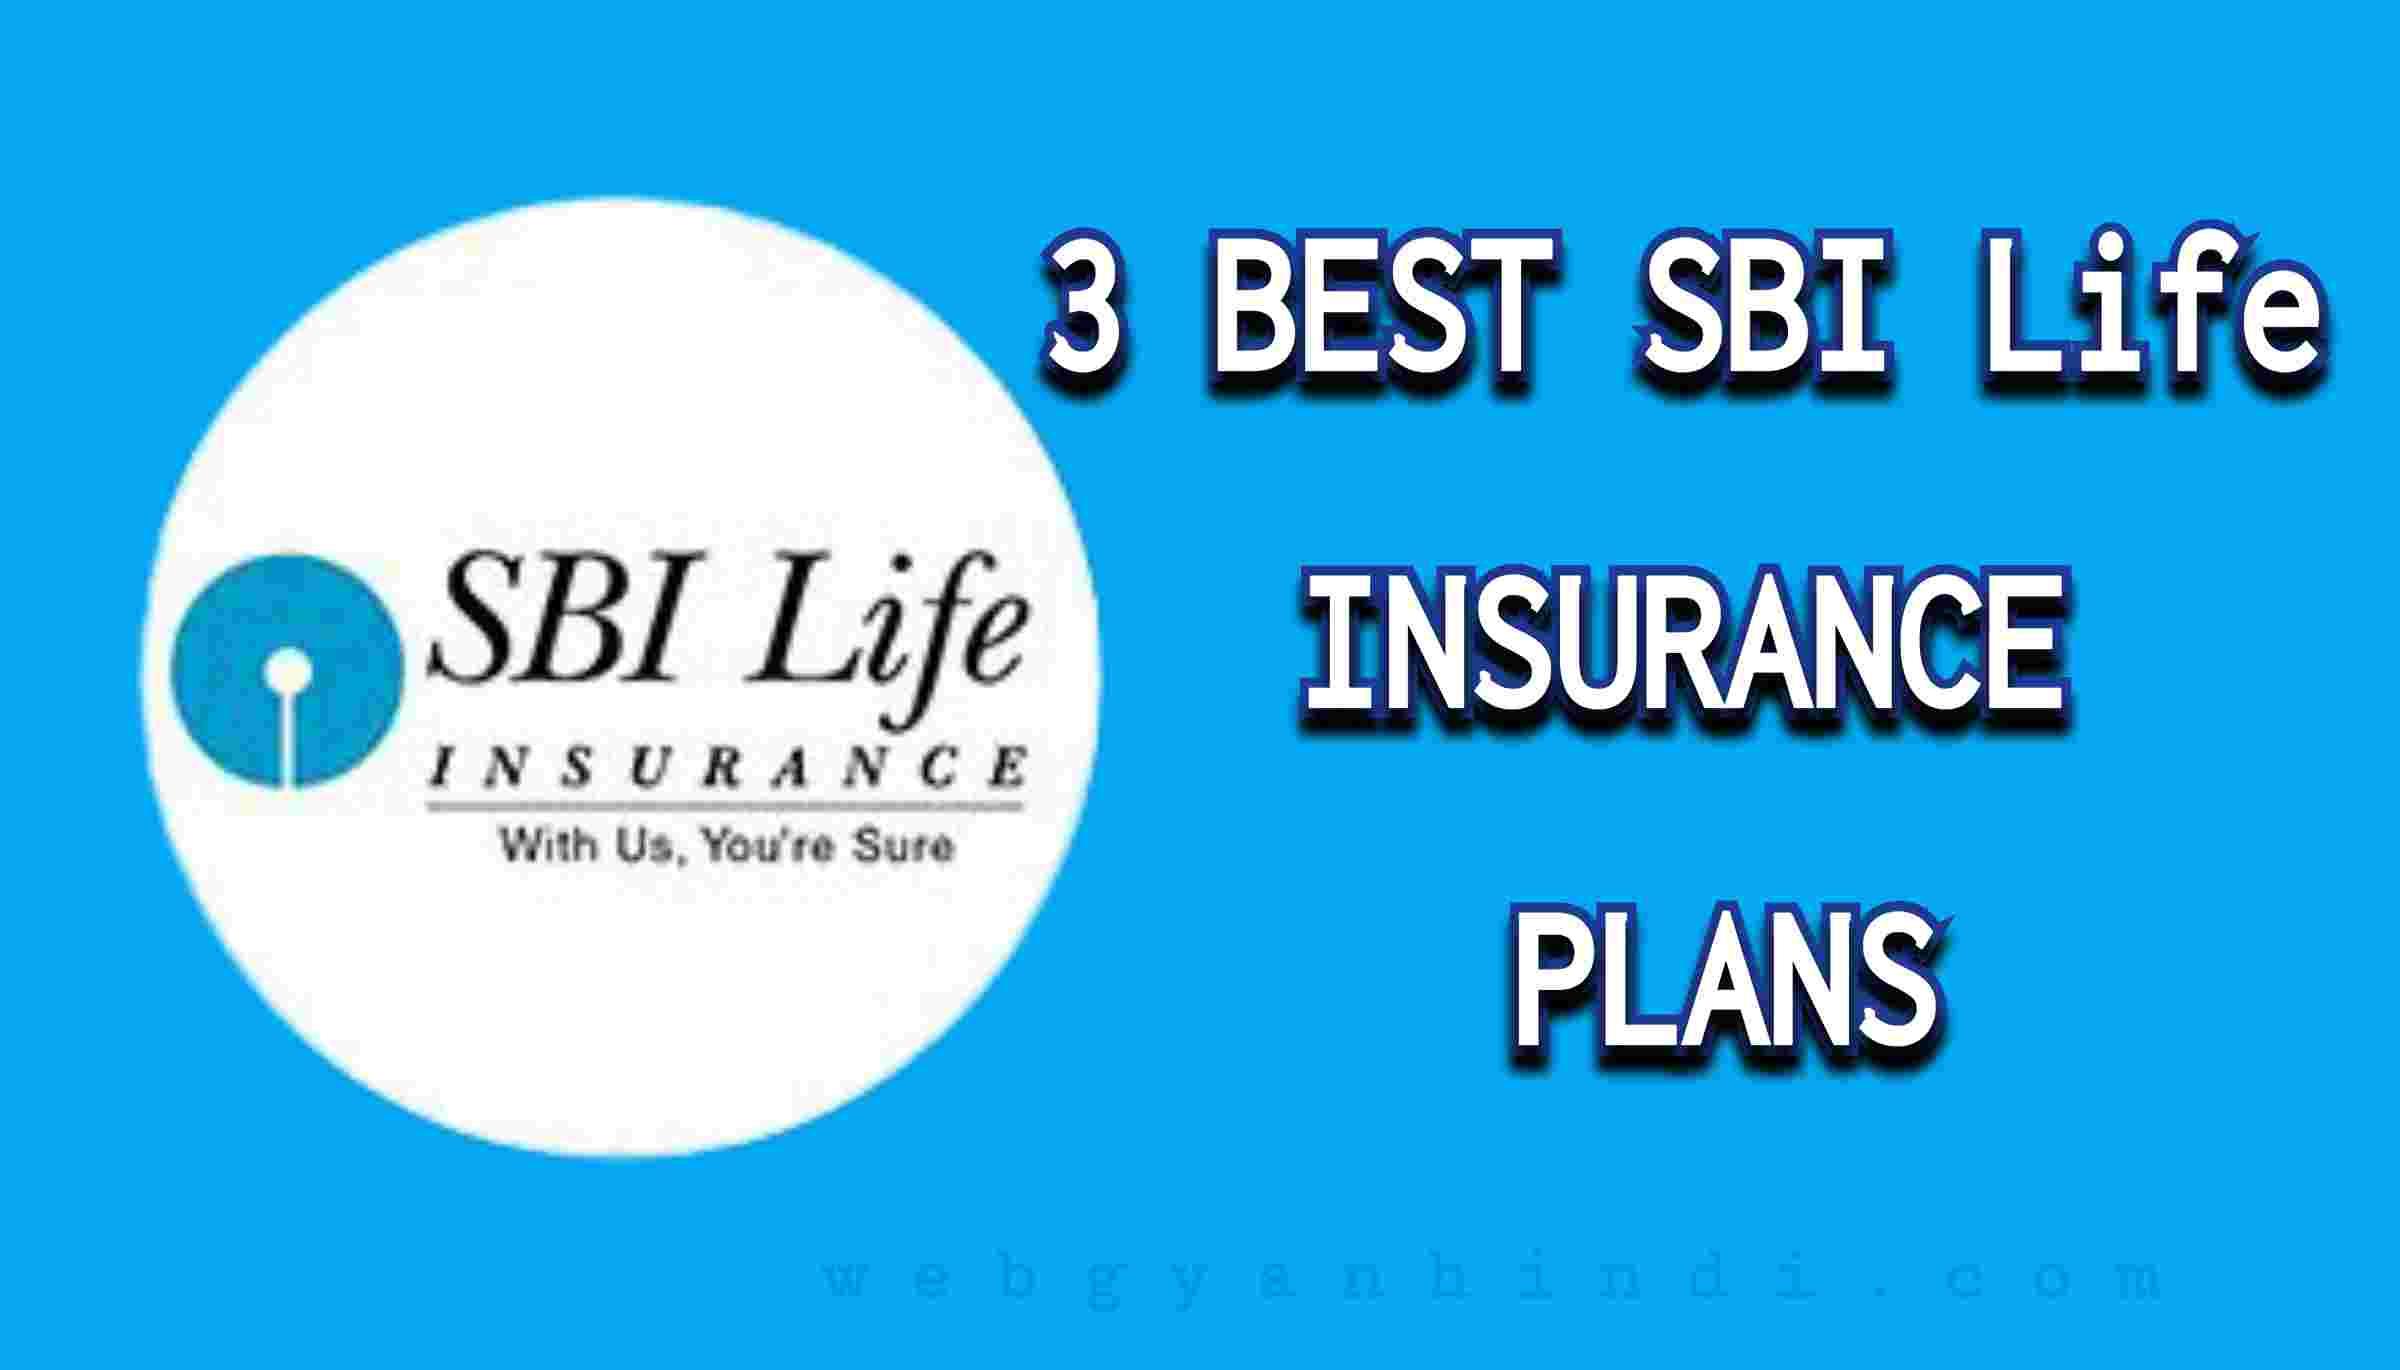 You are currently viewing SBI टर्म इंश्योरेंस प्लान | Top 3 Term Insurance Plans